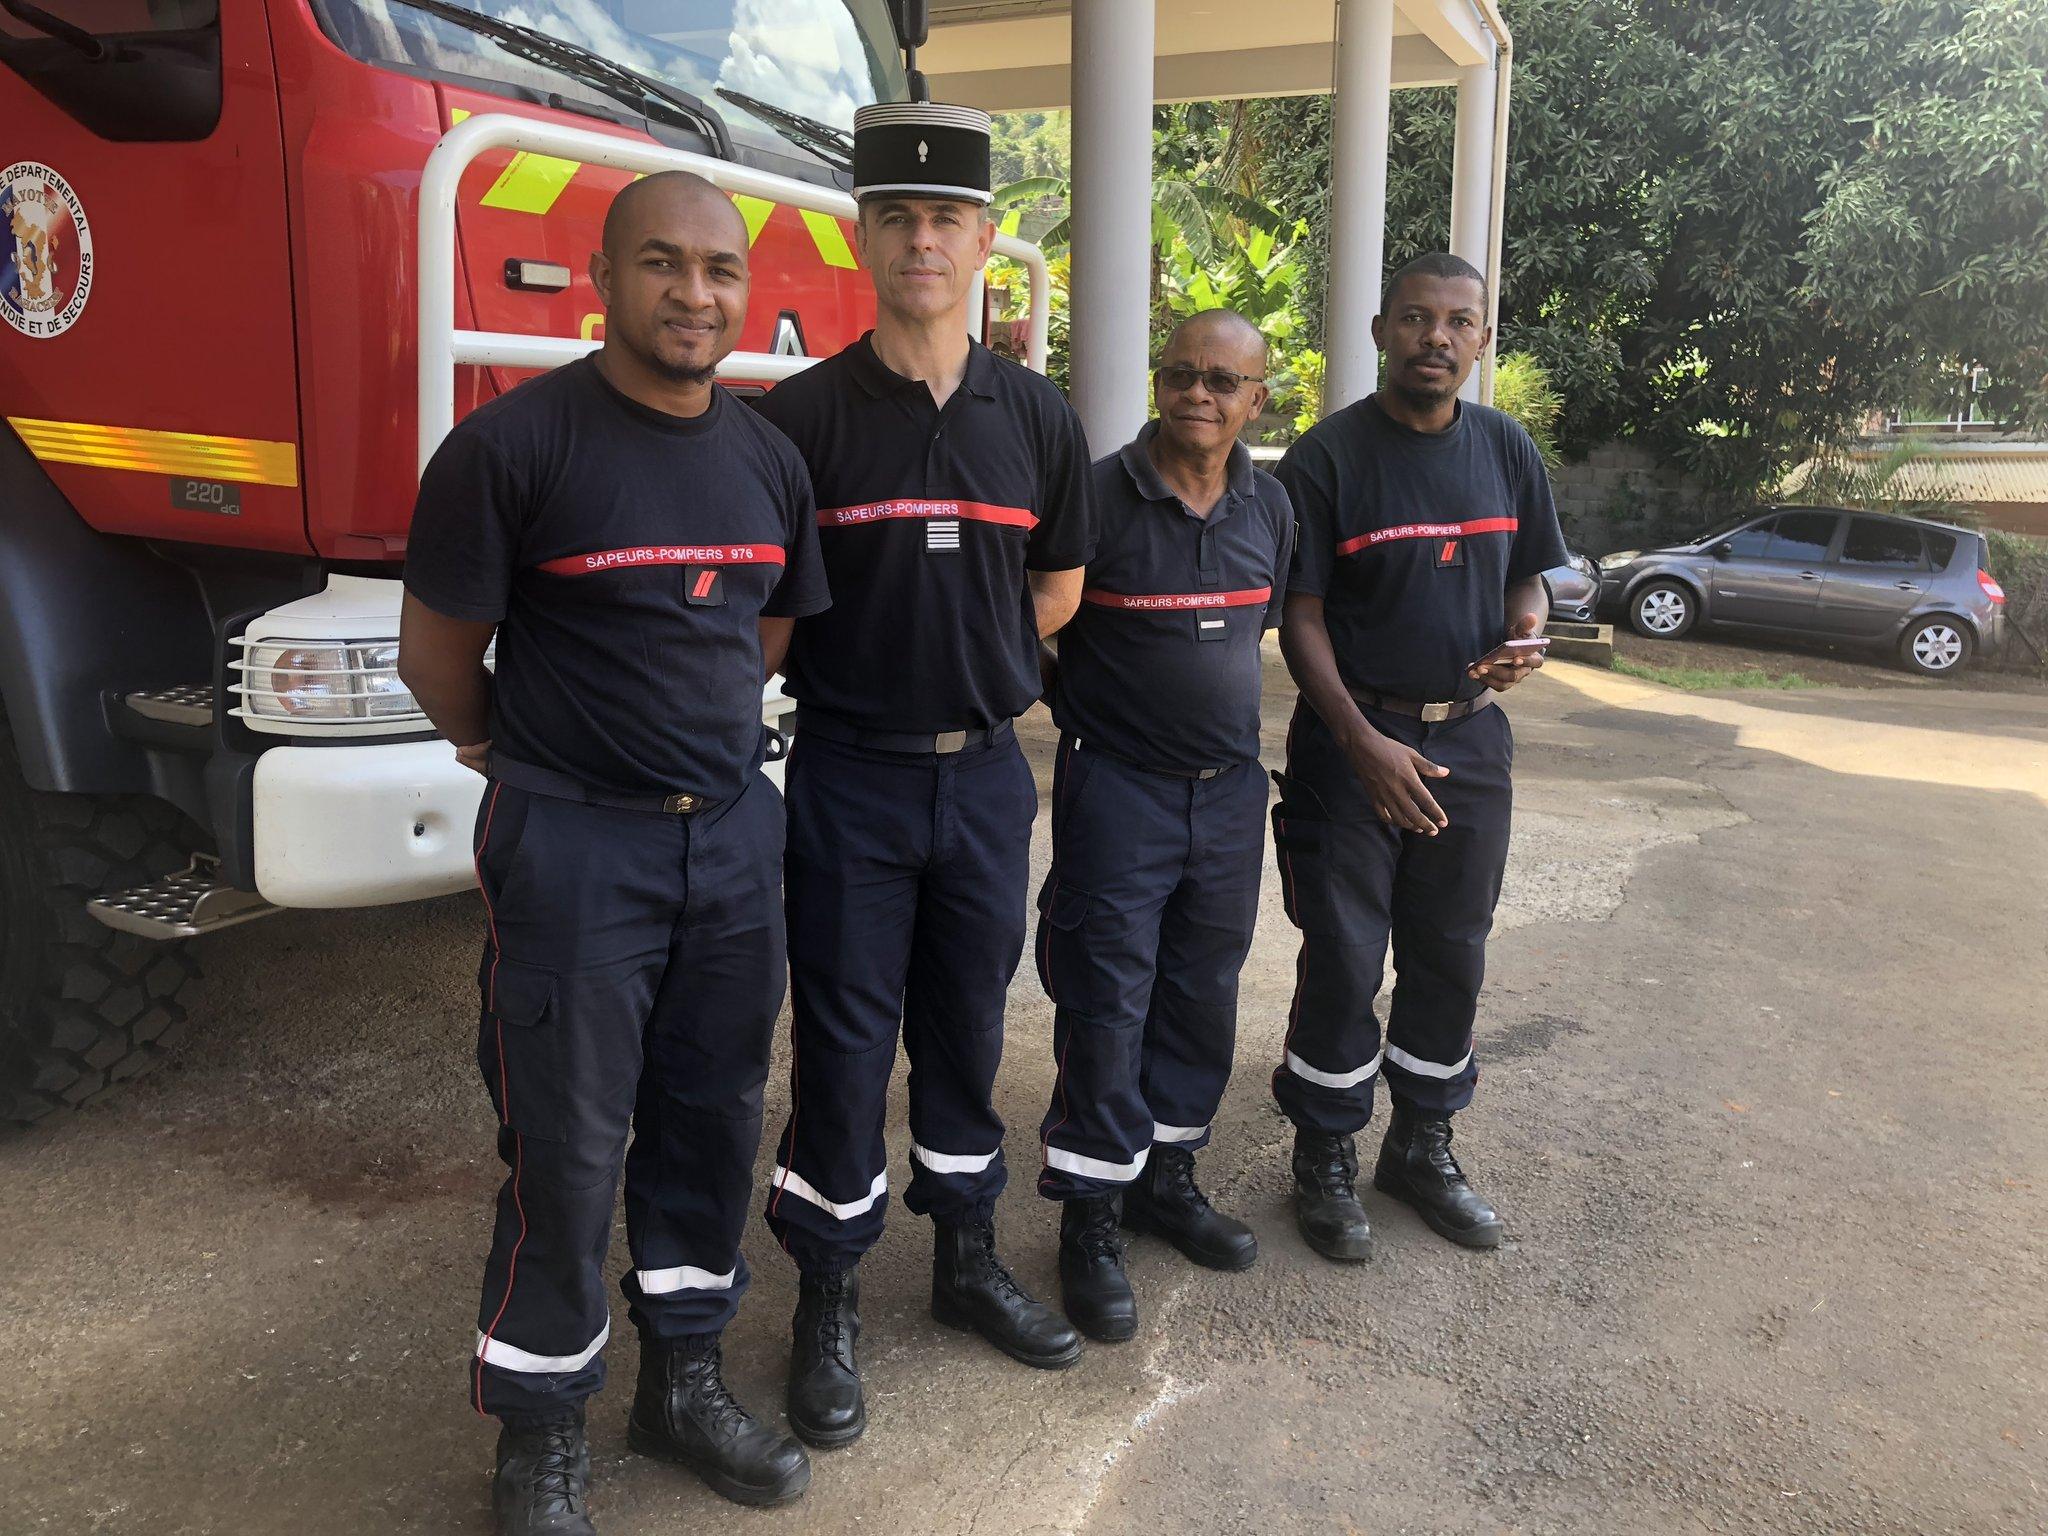 Rencontre Femme Mayotte